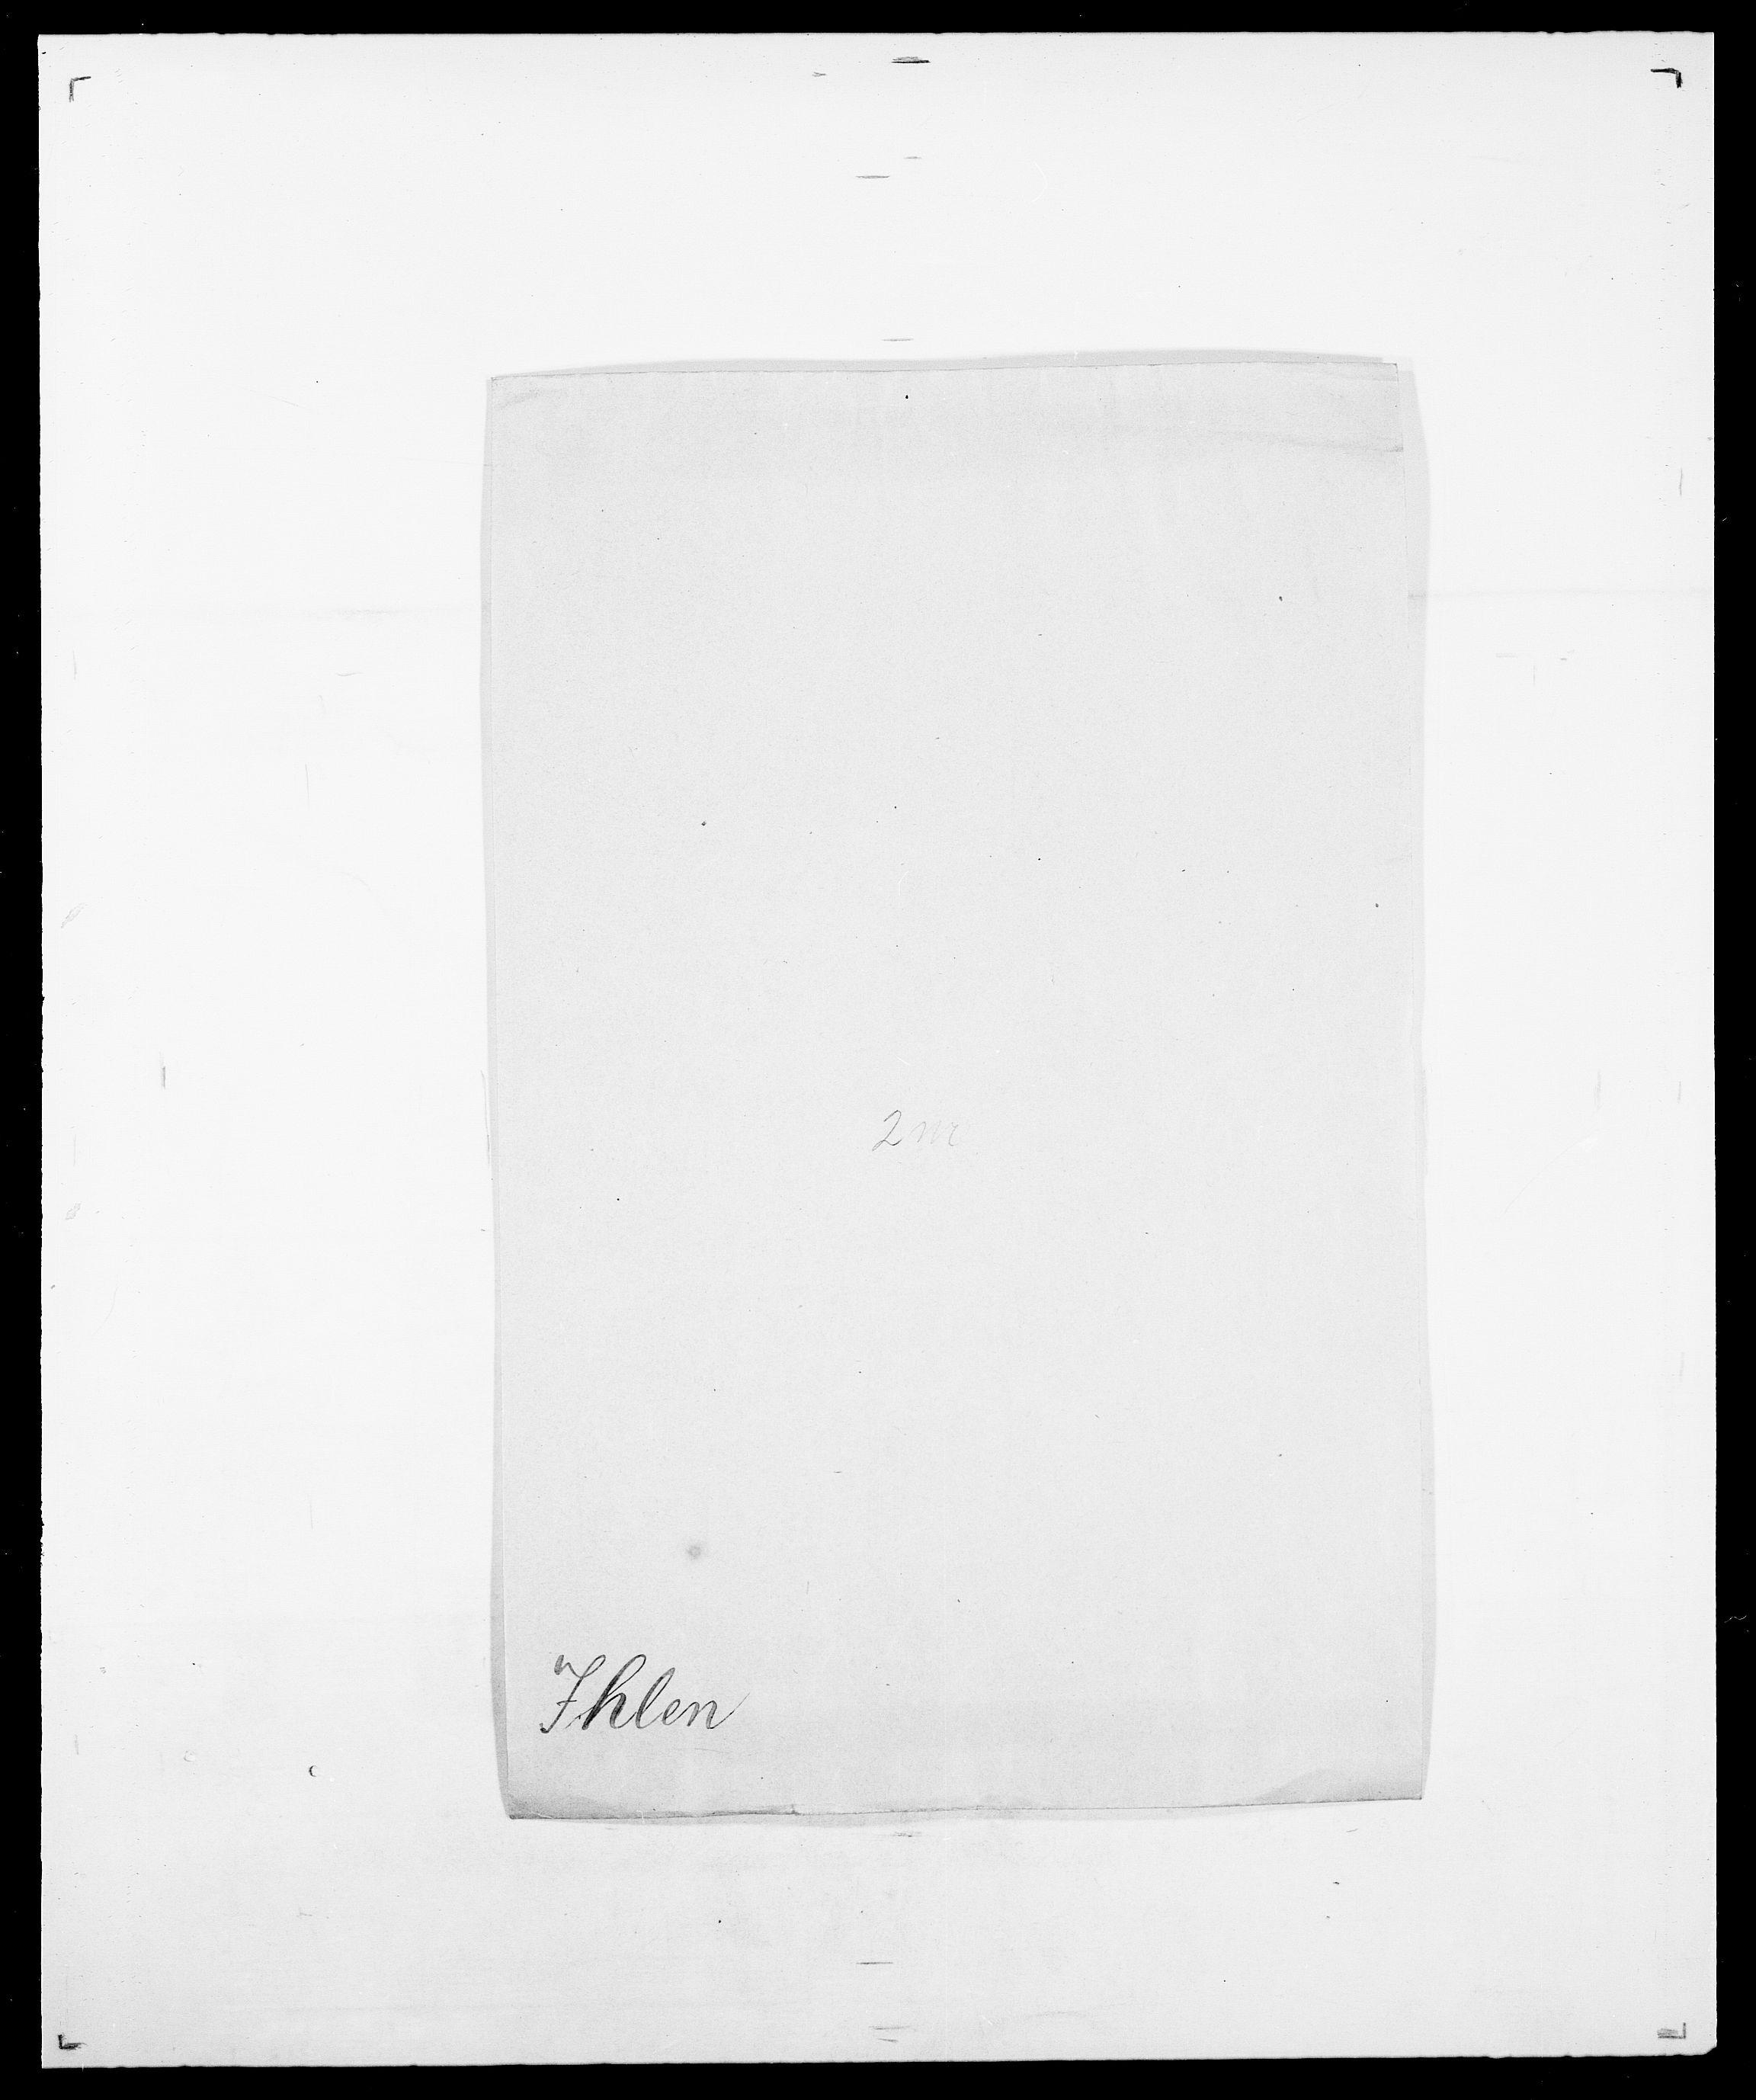 SAO, Delgobe, Charles Antoine - samling, D/Da/L0019: van der Hude - Joys, s. 762